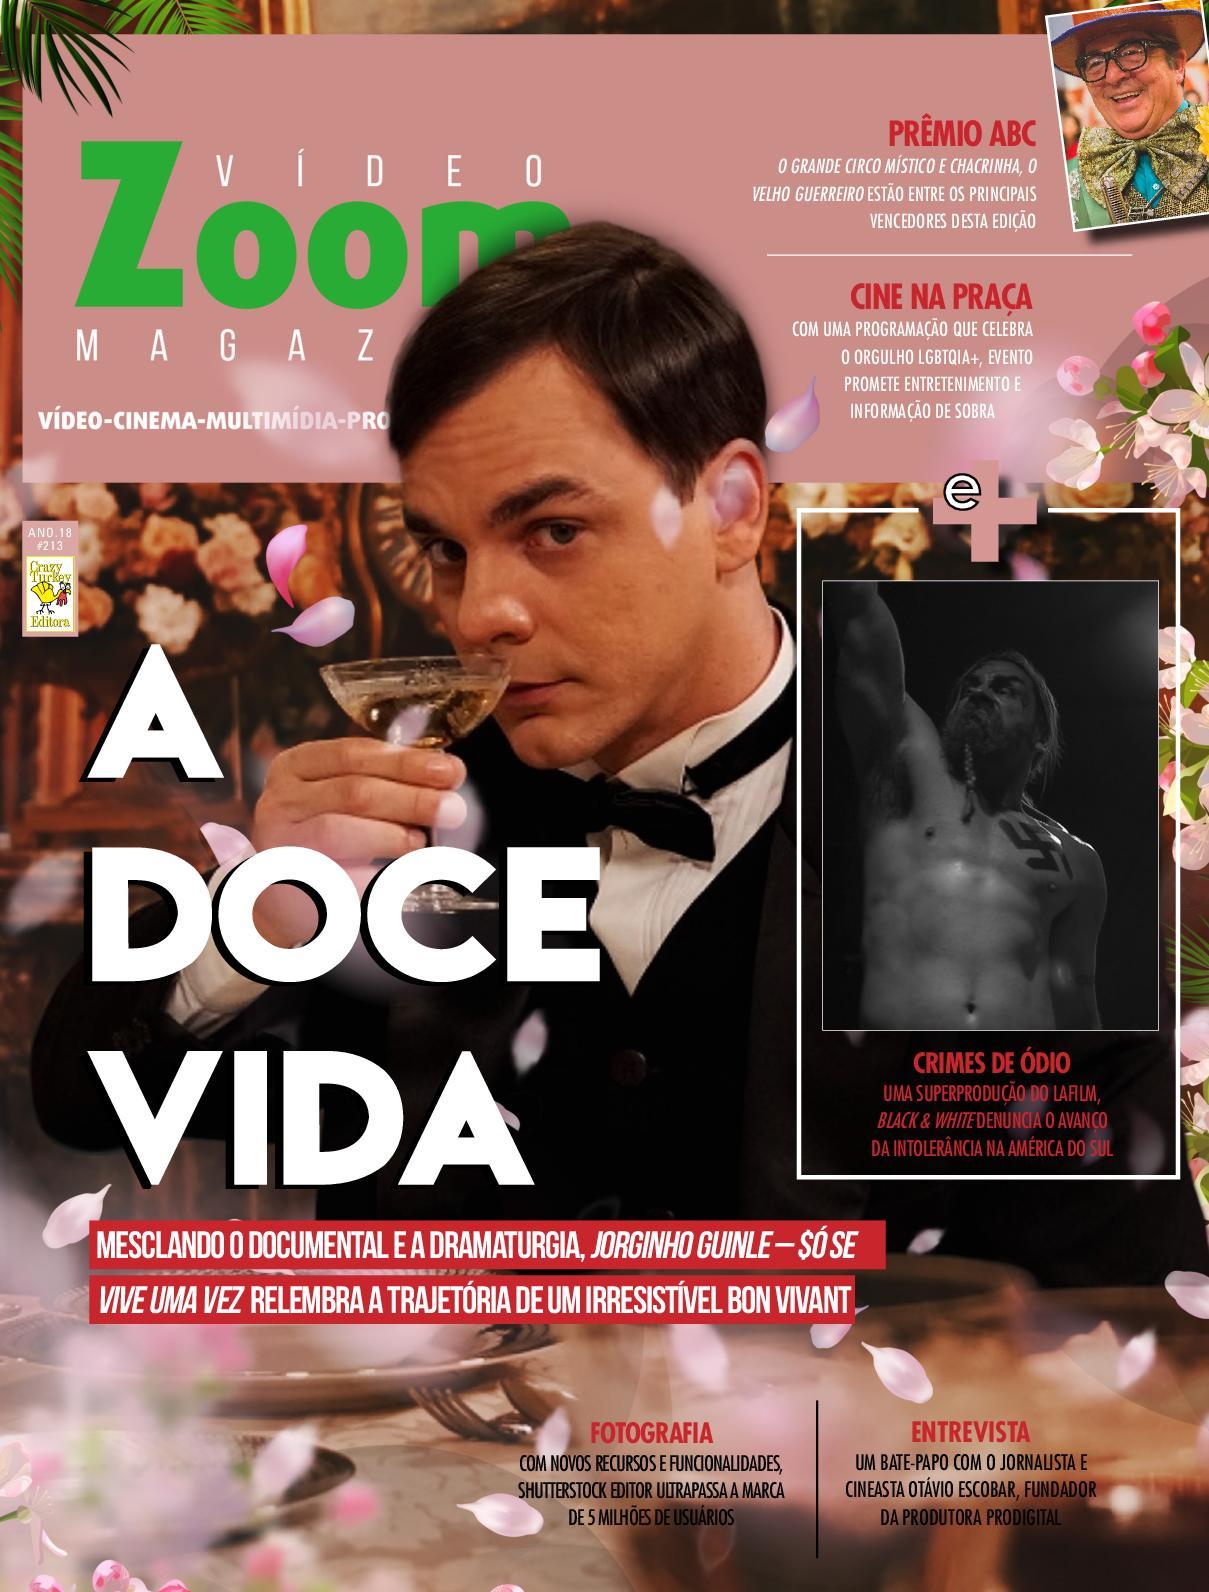 FILME TRILHA RICO DO SONORA OU BAIXAR TENTANDO FIQUE MORRA